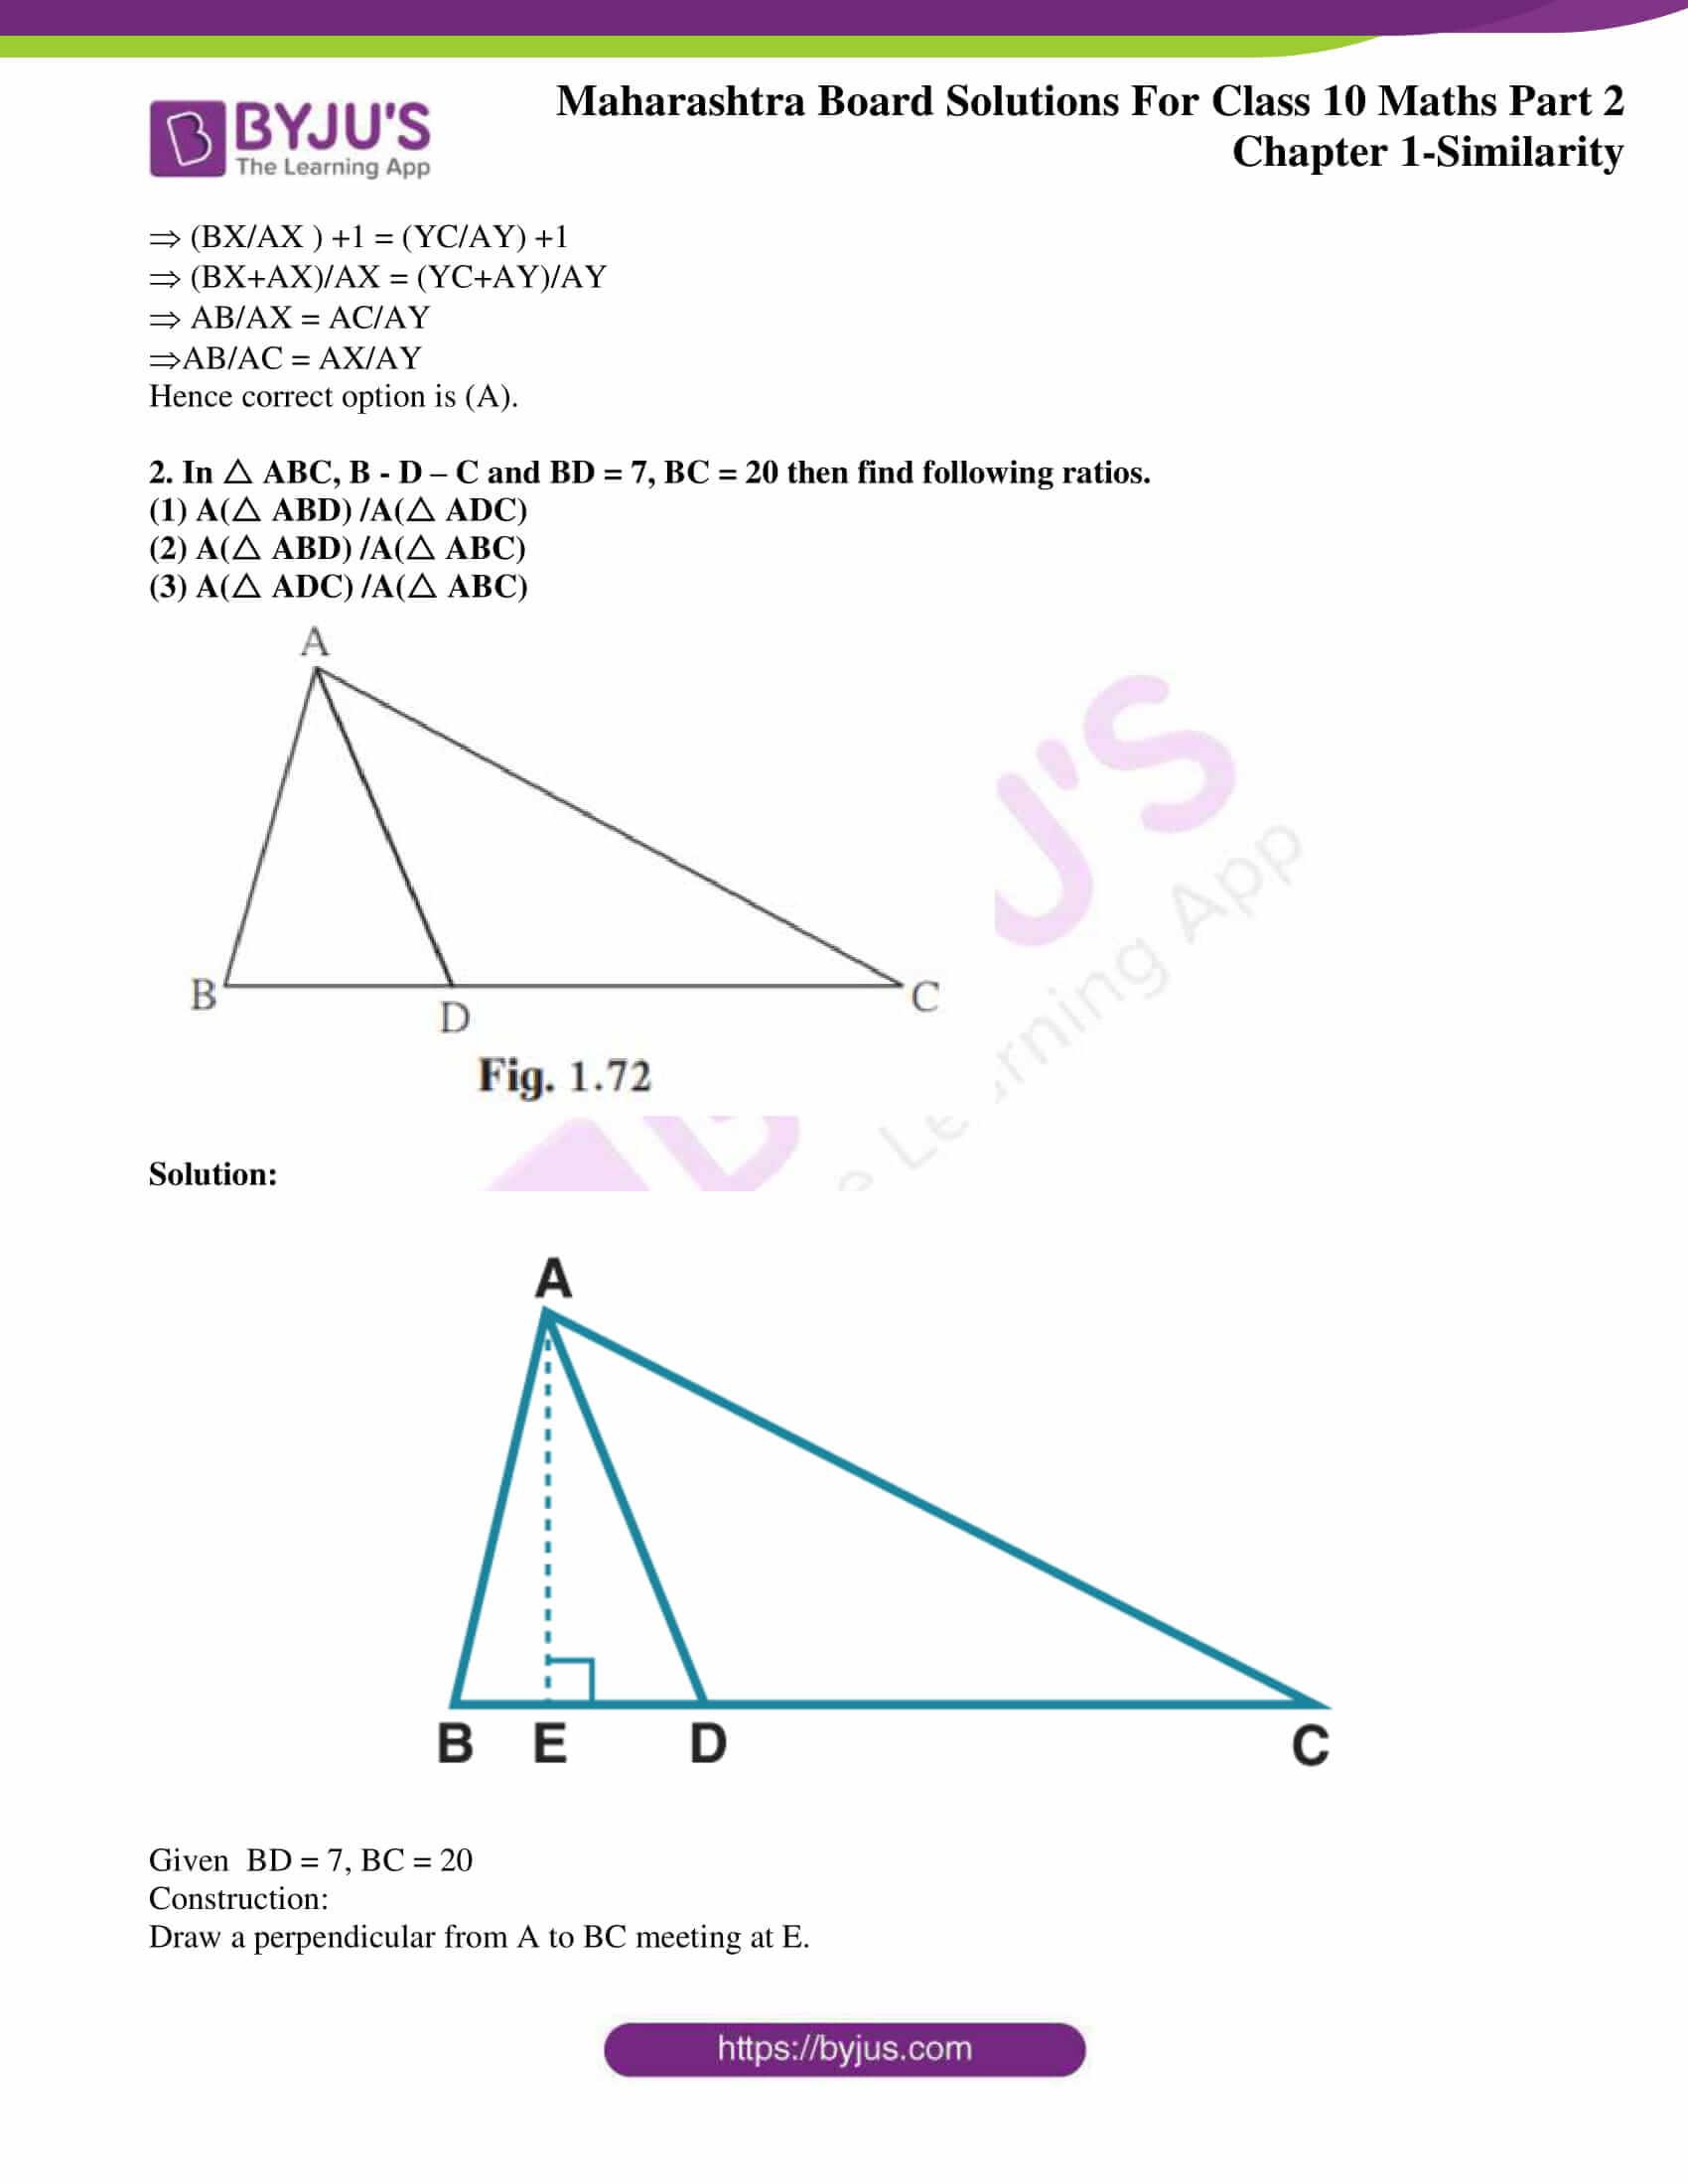 msbshse sol class 10 maths part 2 chapter 1 21